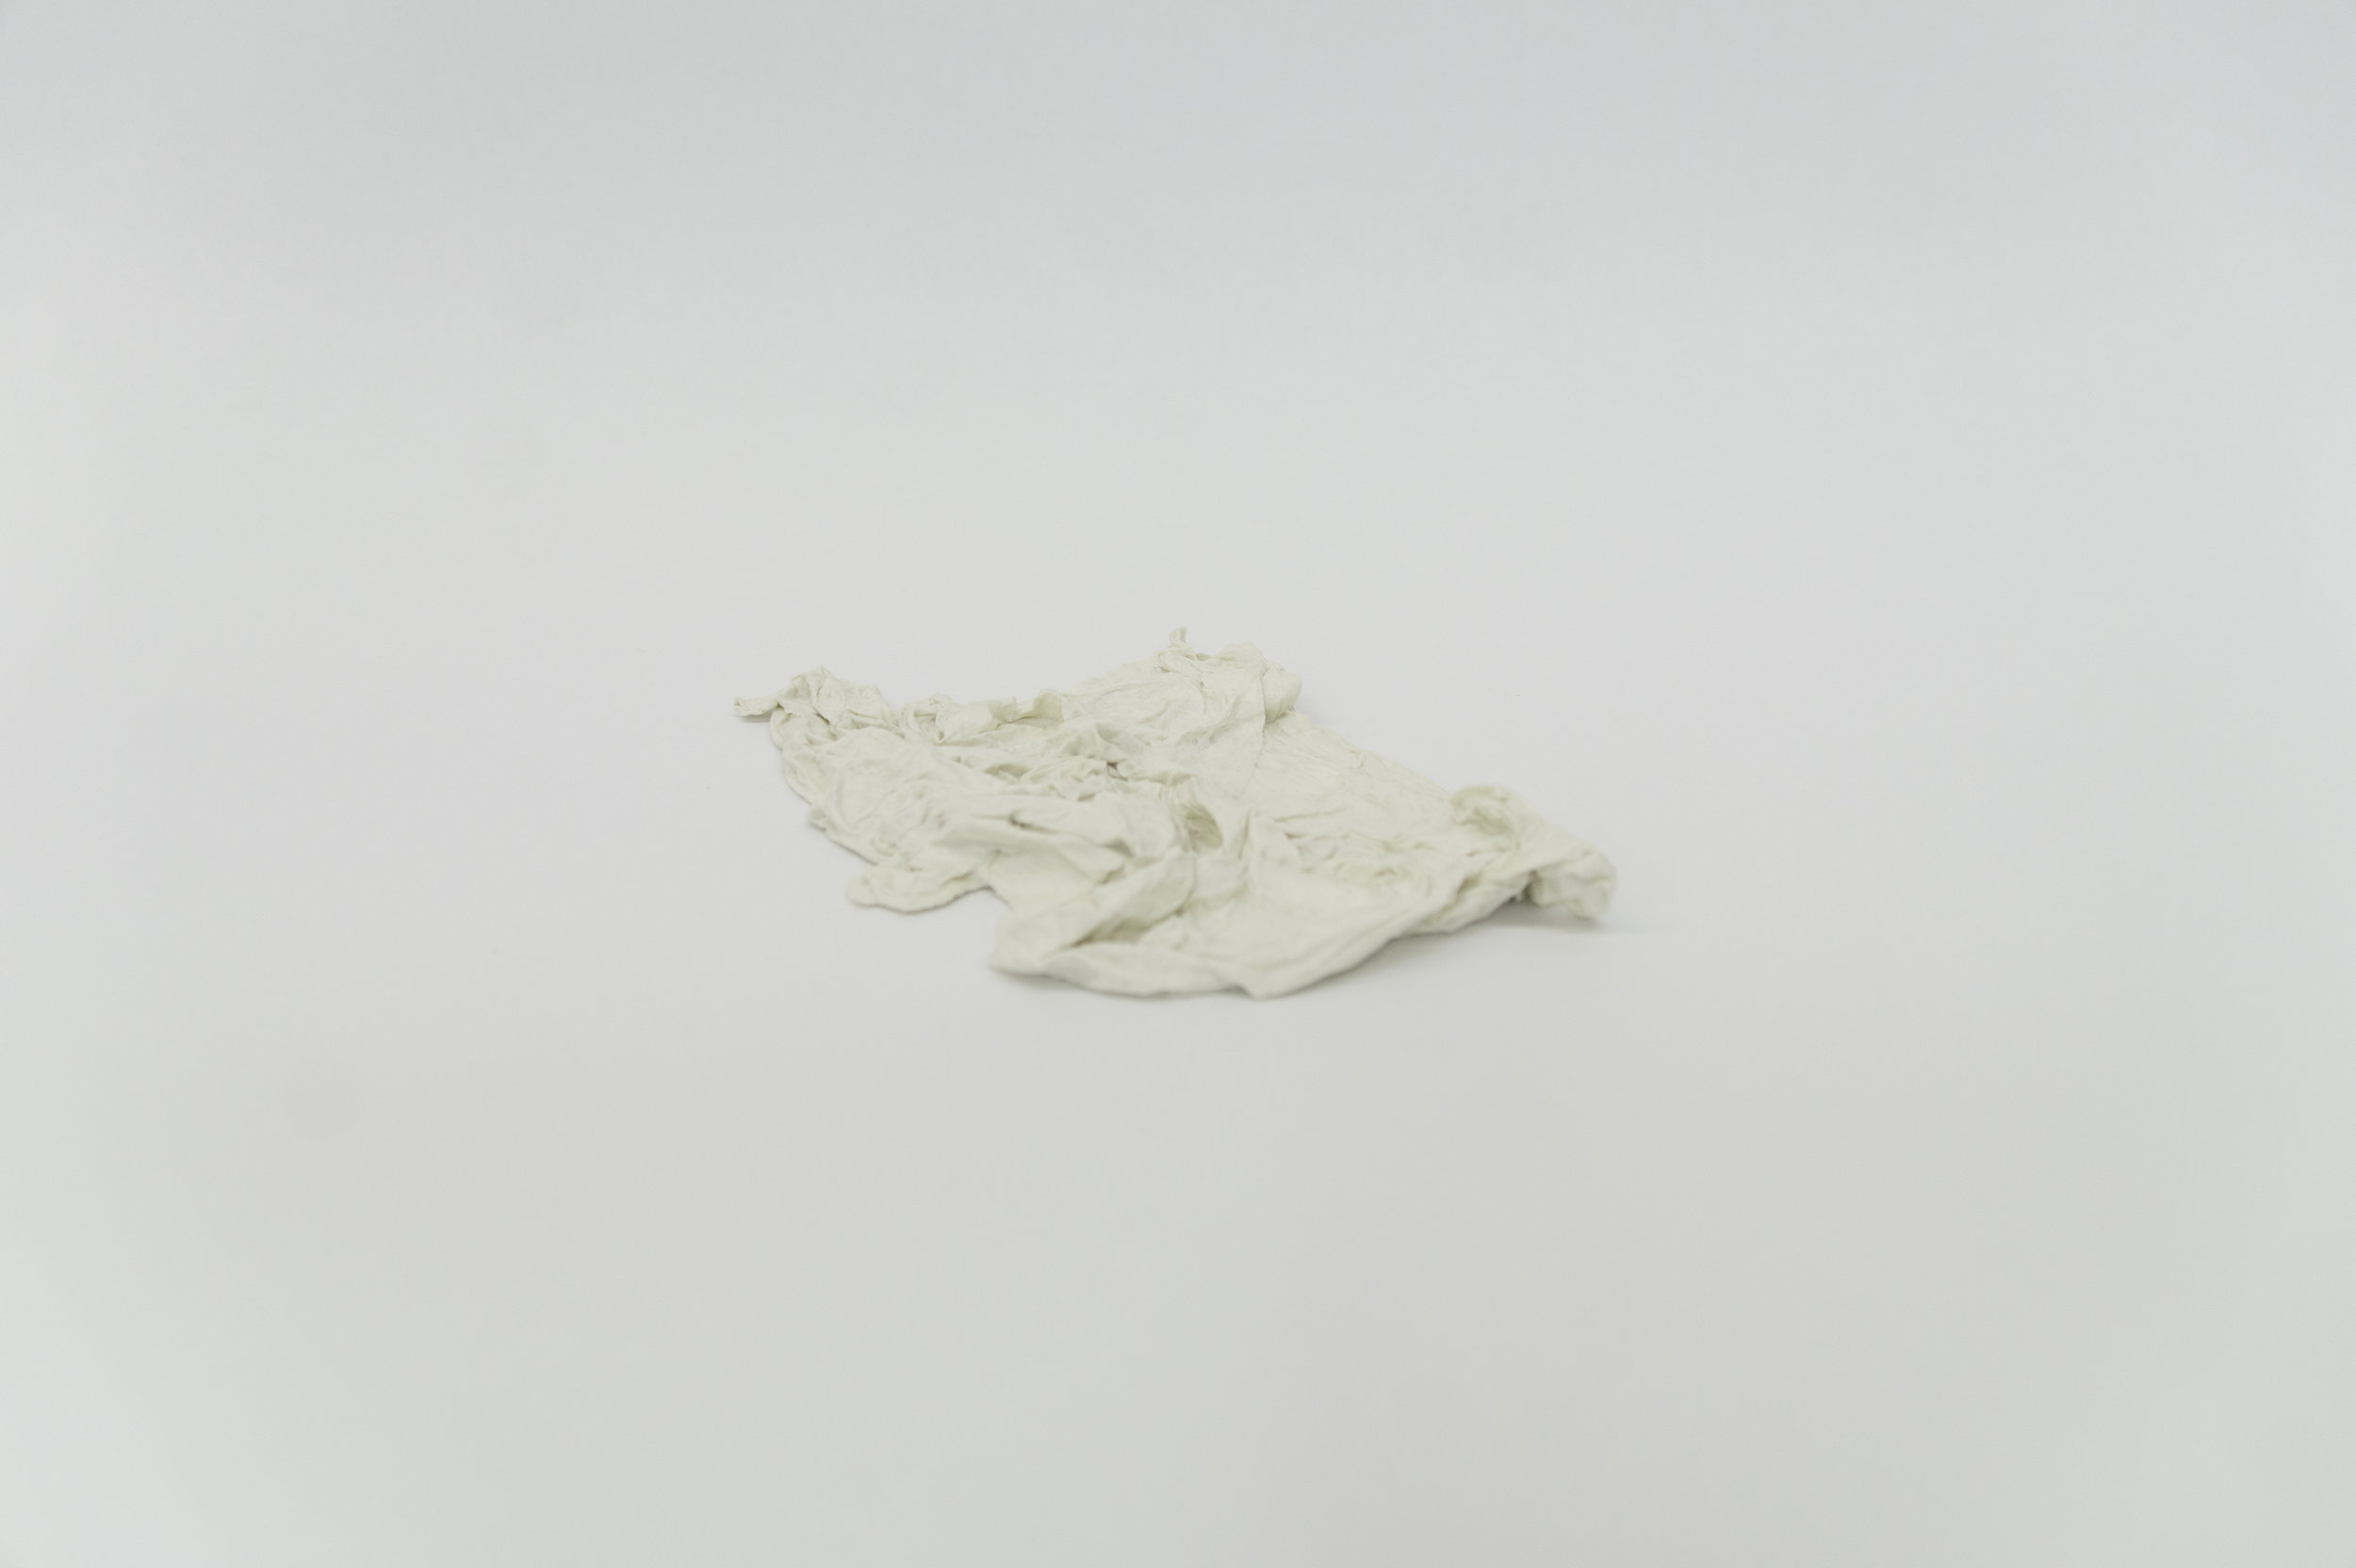 Untitled 1 (Porcelain Paper Towel)